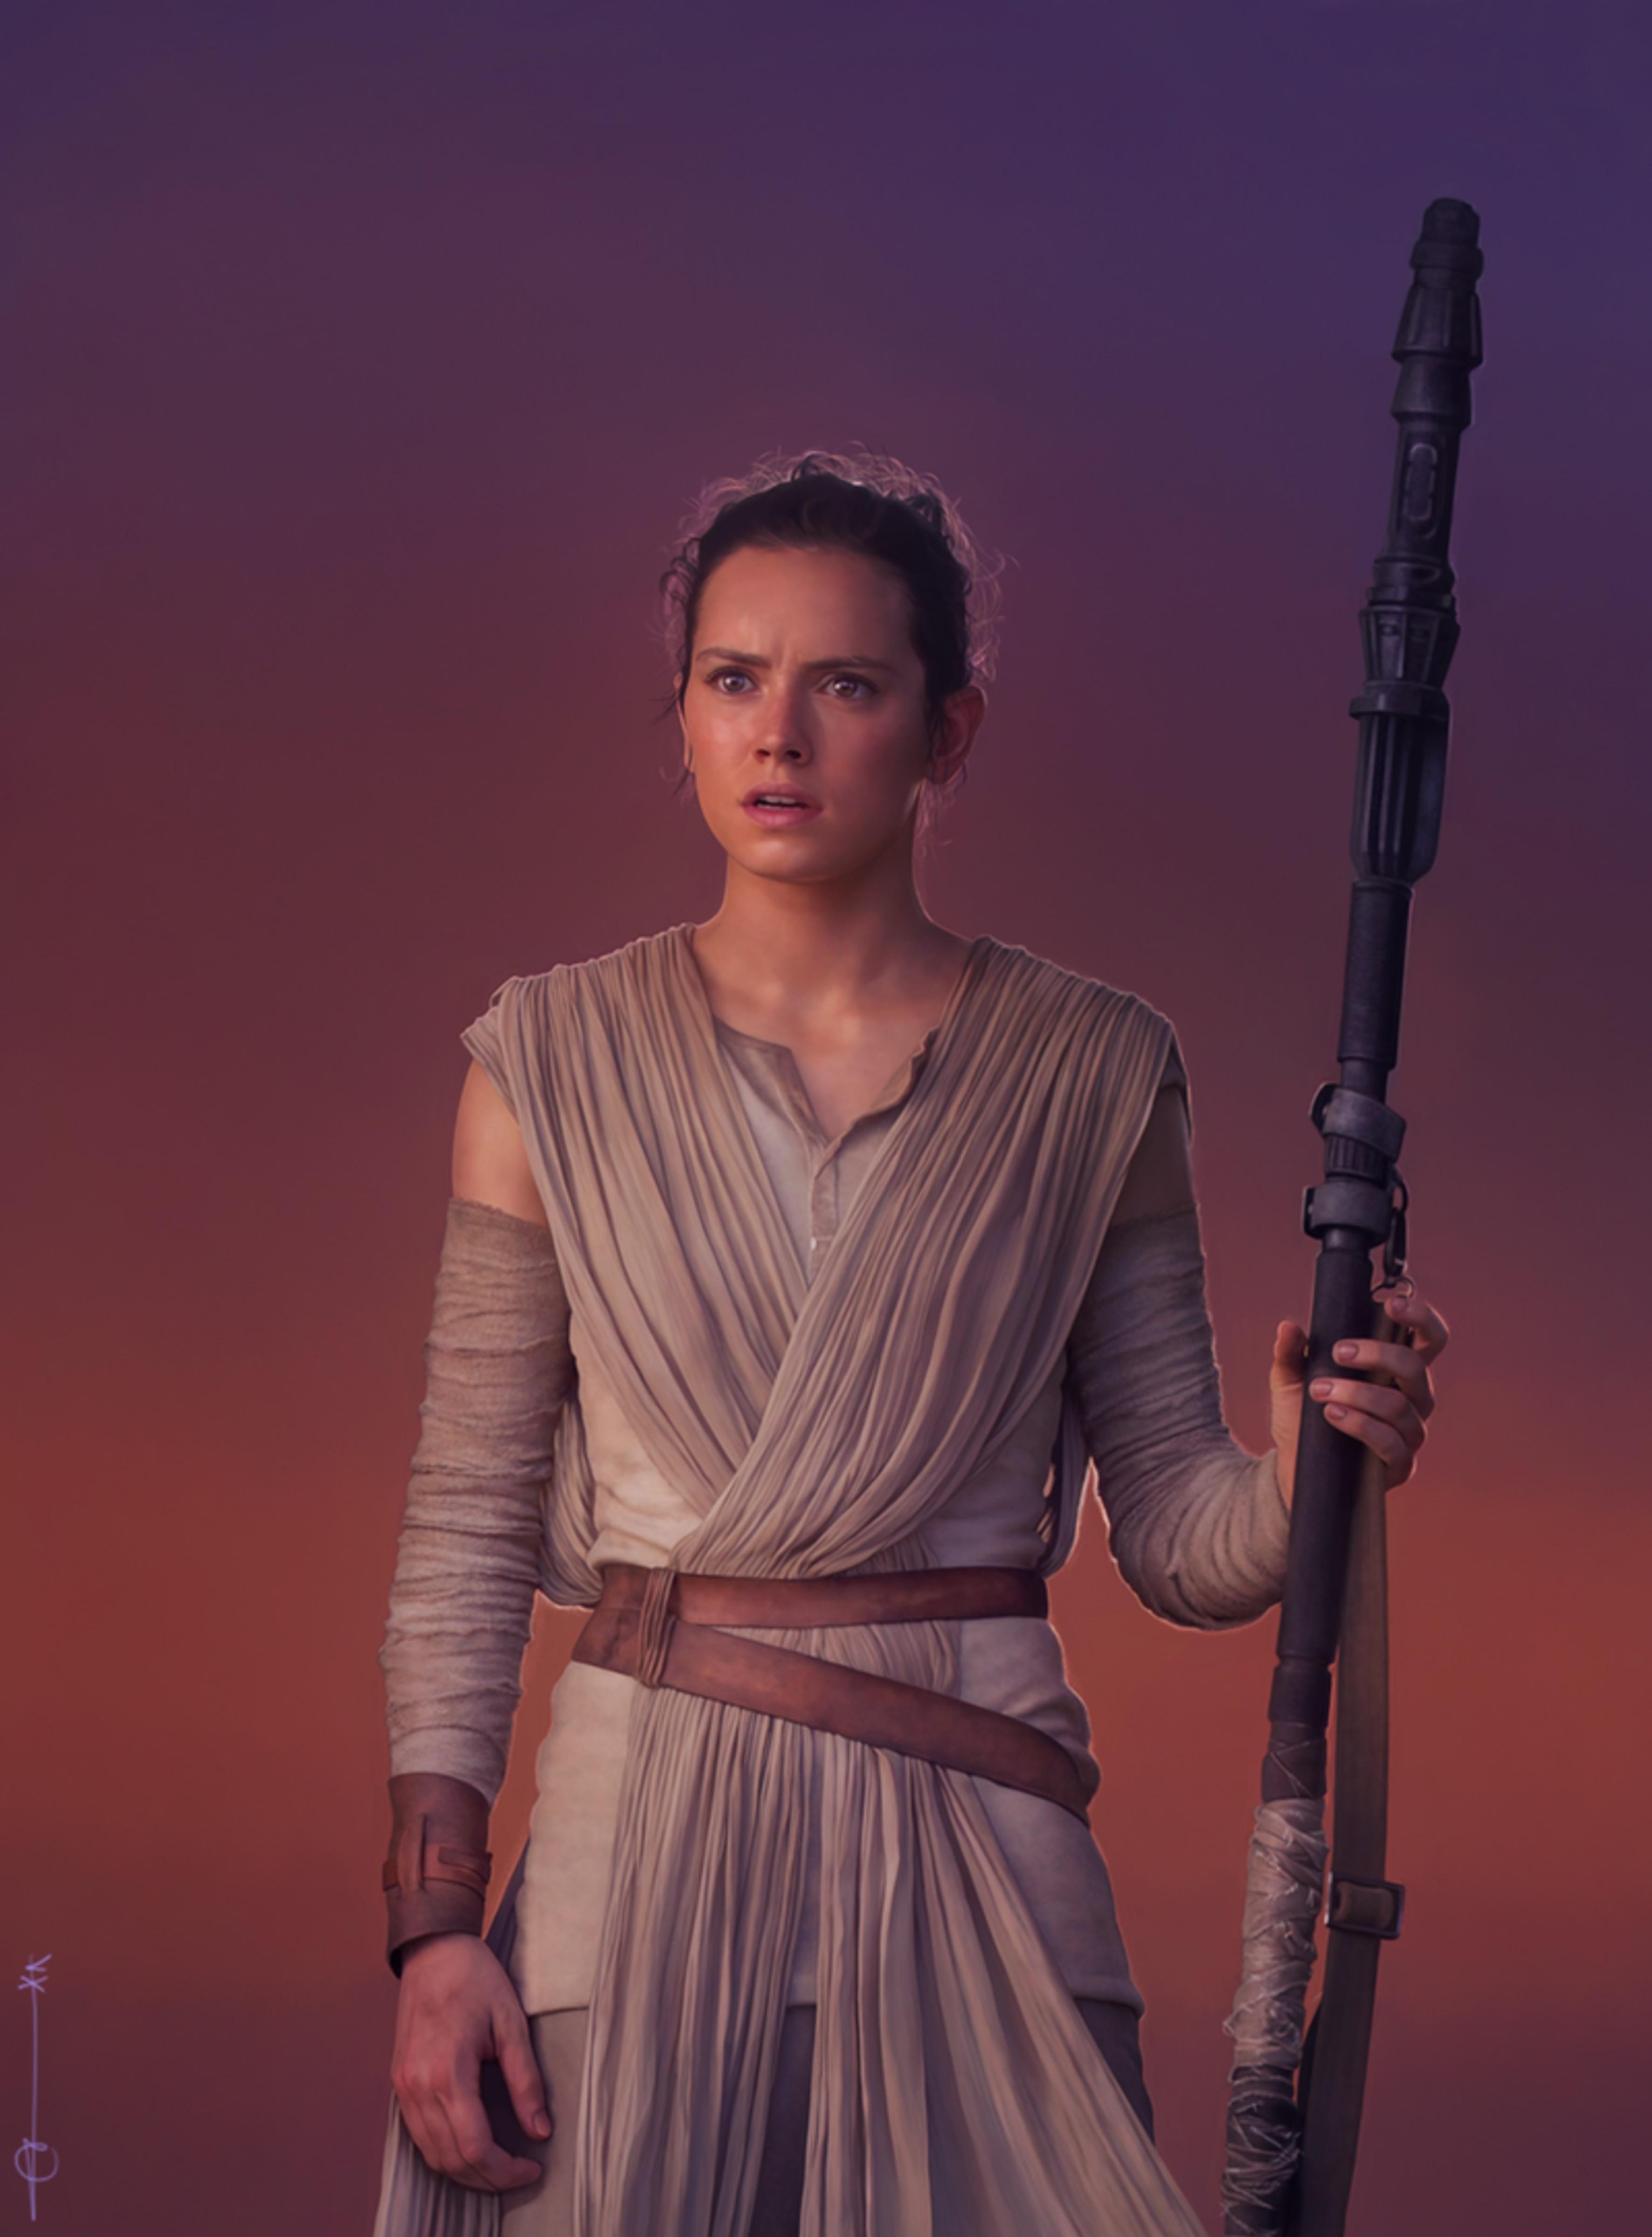 Great Wallpaper Movie Rey - Star-Wars-model-sitting-fashion-fan-art-Rey-beauty-human-positions-photo-shoot-star-wars-episode-vii-the-force-awakens-3543x4797-px-629409  Image_364483.jpg